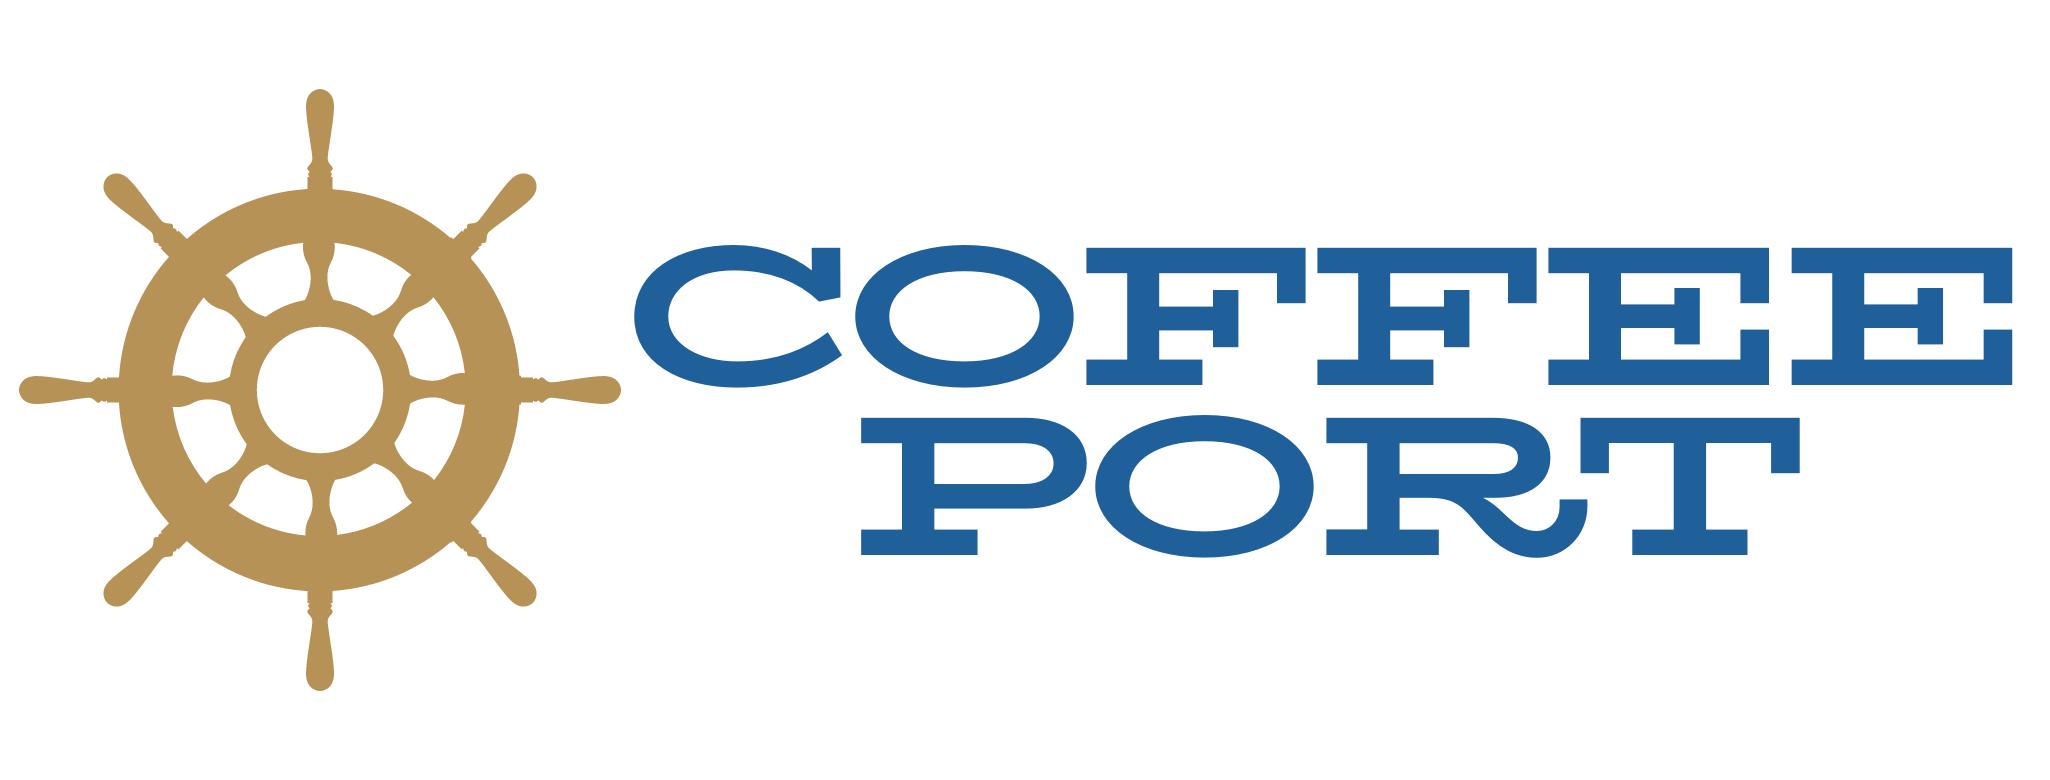 Coffeeport